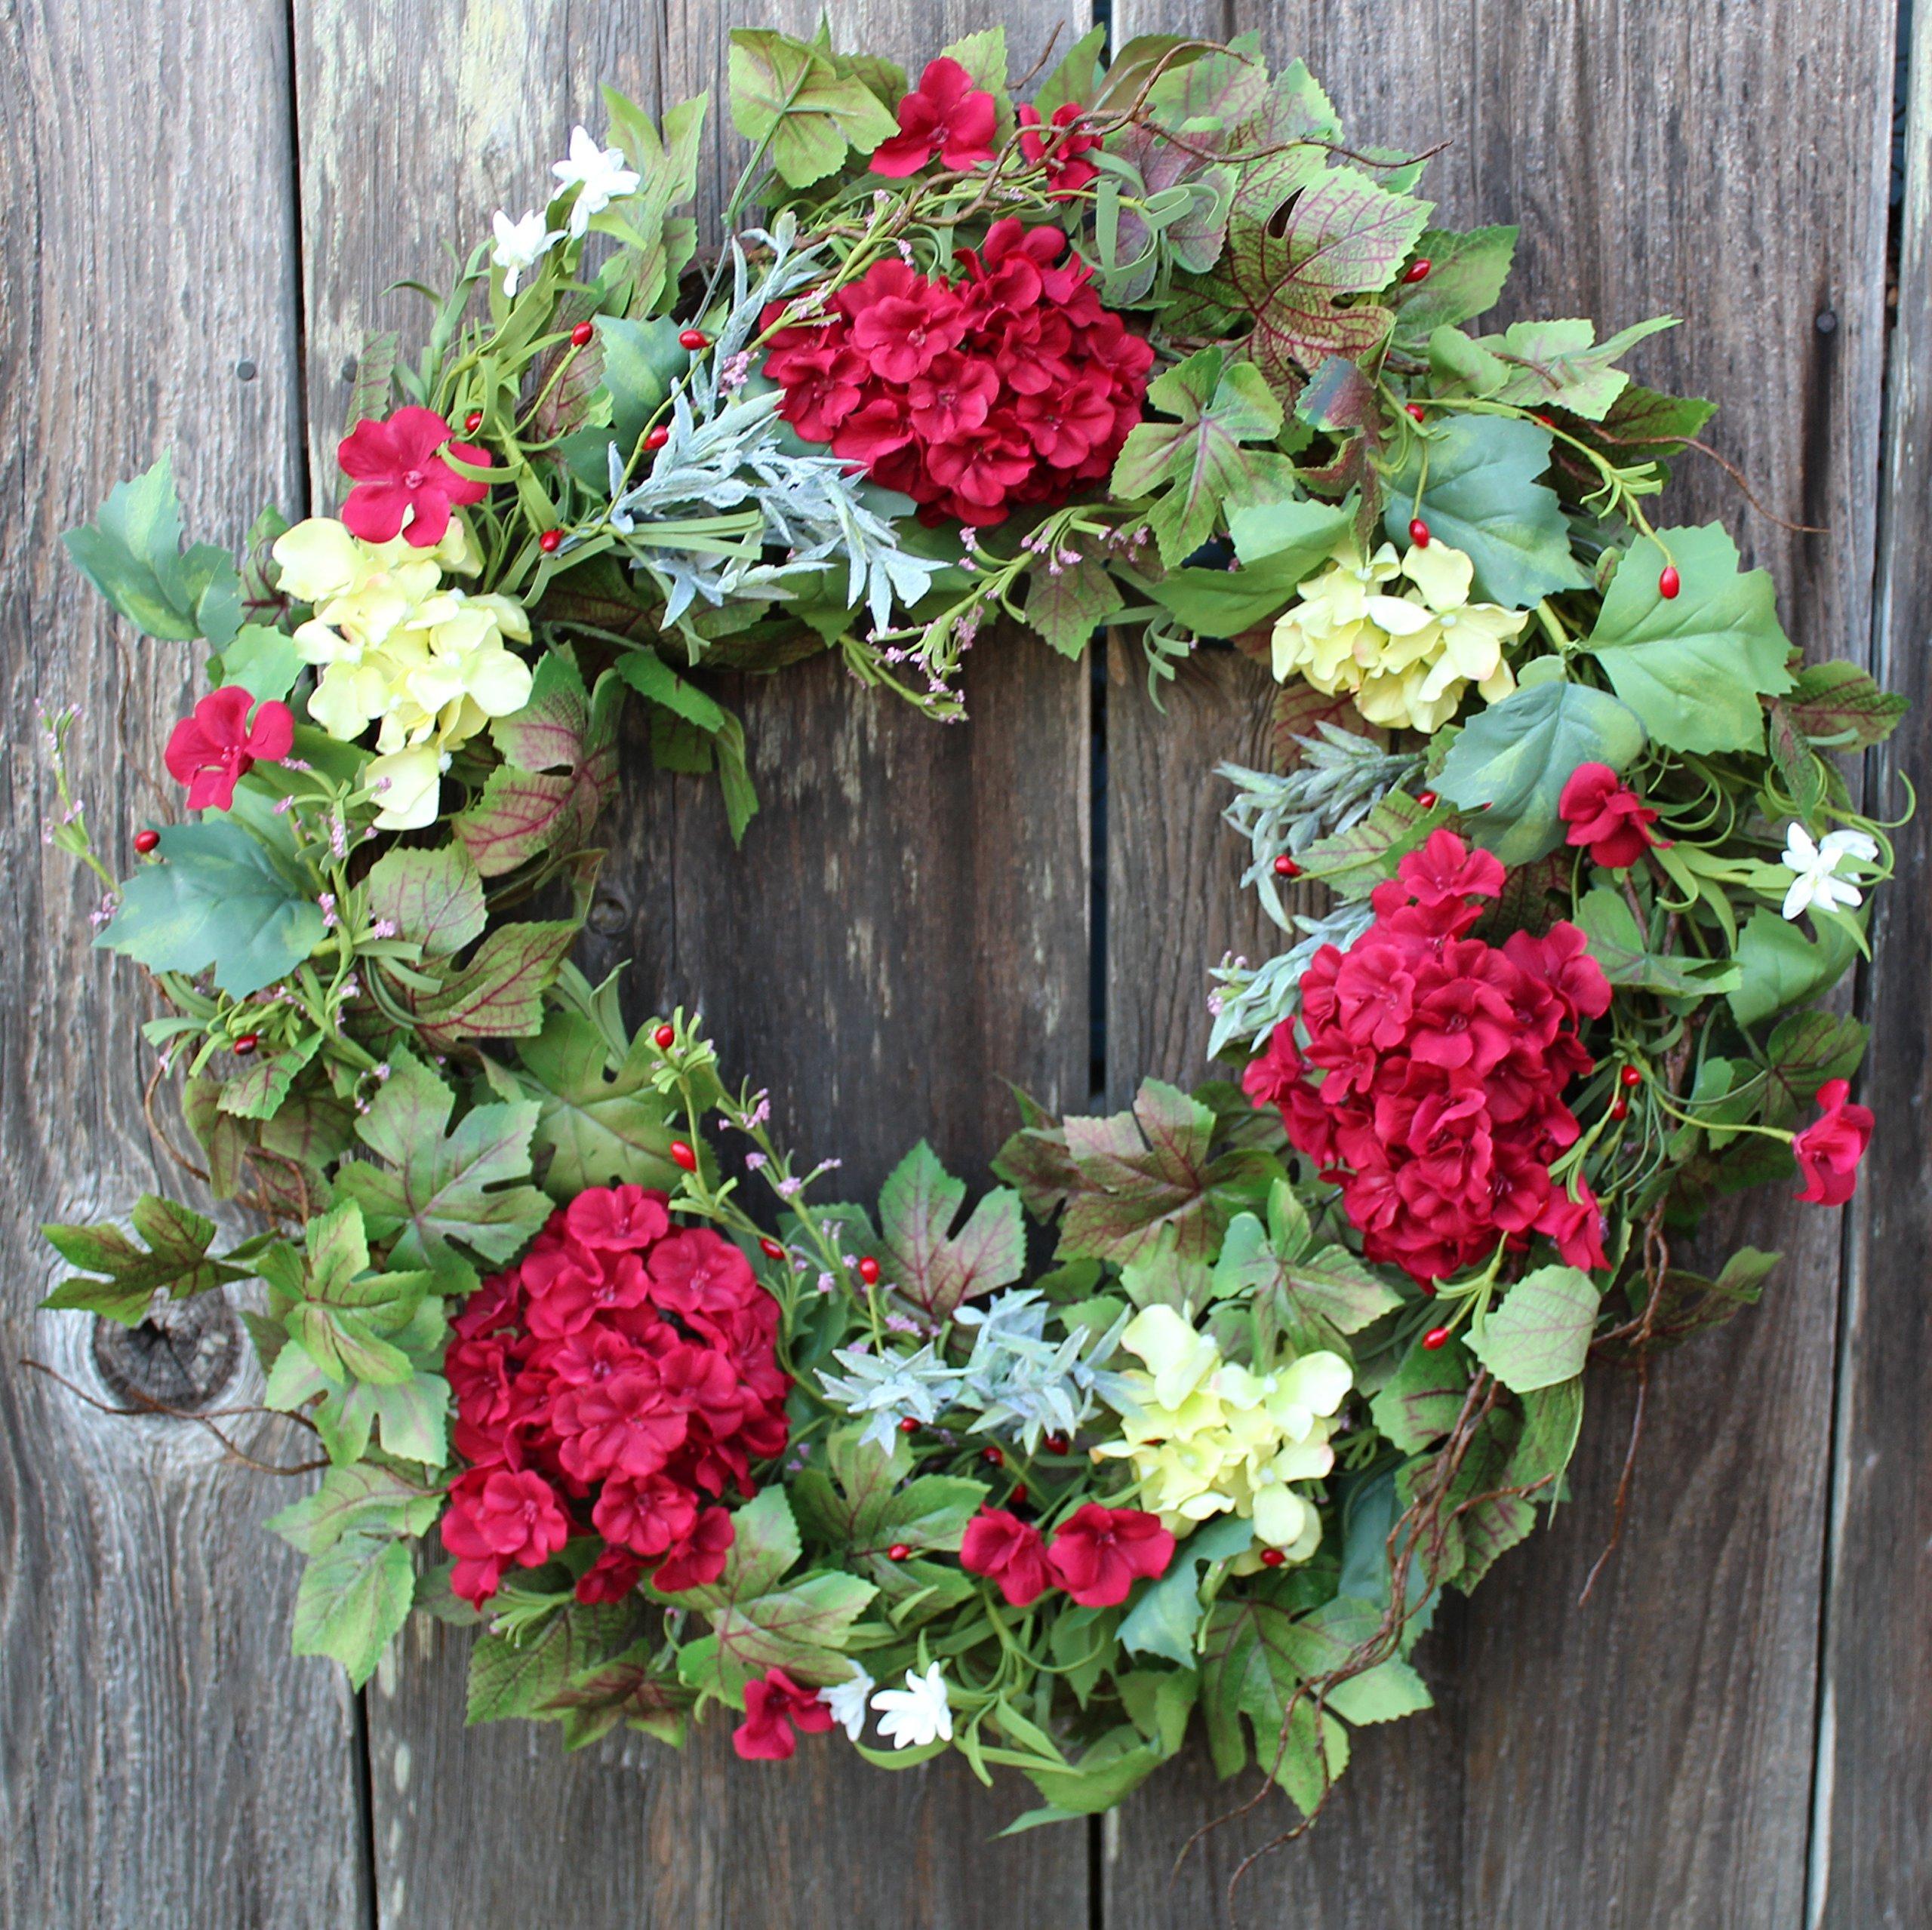 Belmont Silk Decorative Front Door Wreath 24 Inch   Year Round Beautiful Silk  Wreath Transforms Front Door Decor, Handcrafted With Care, White Storage  Gift ...